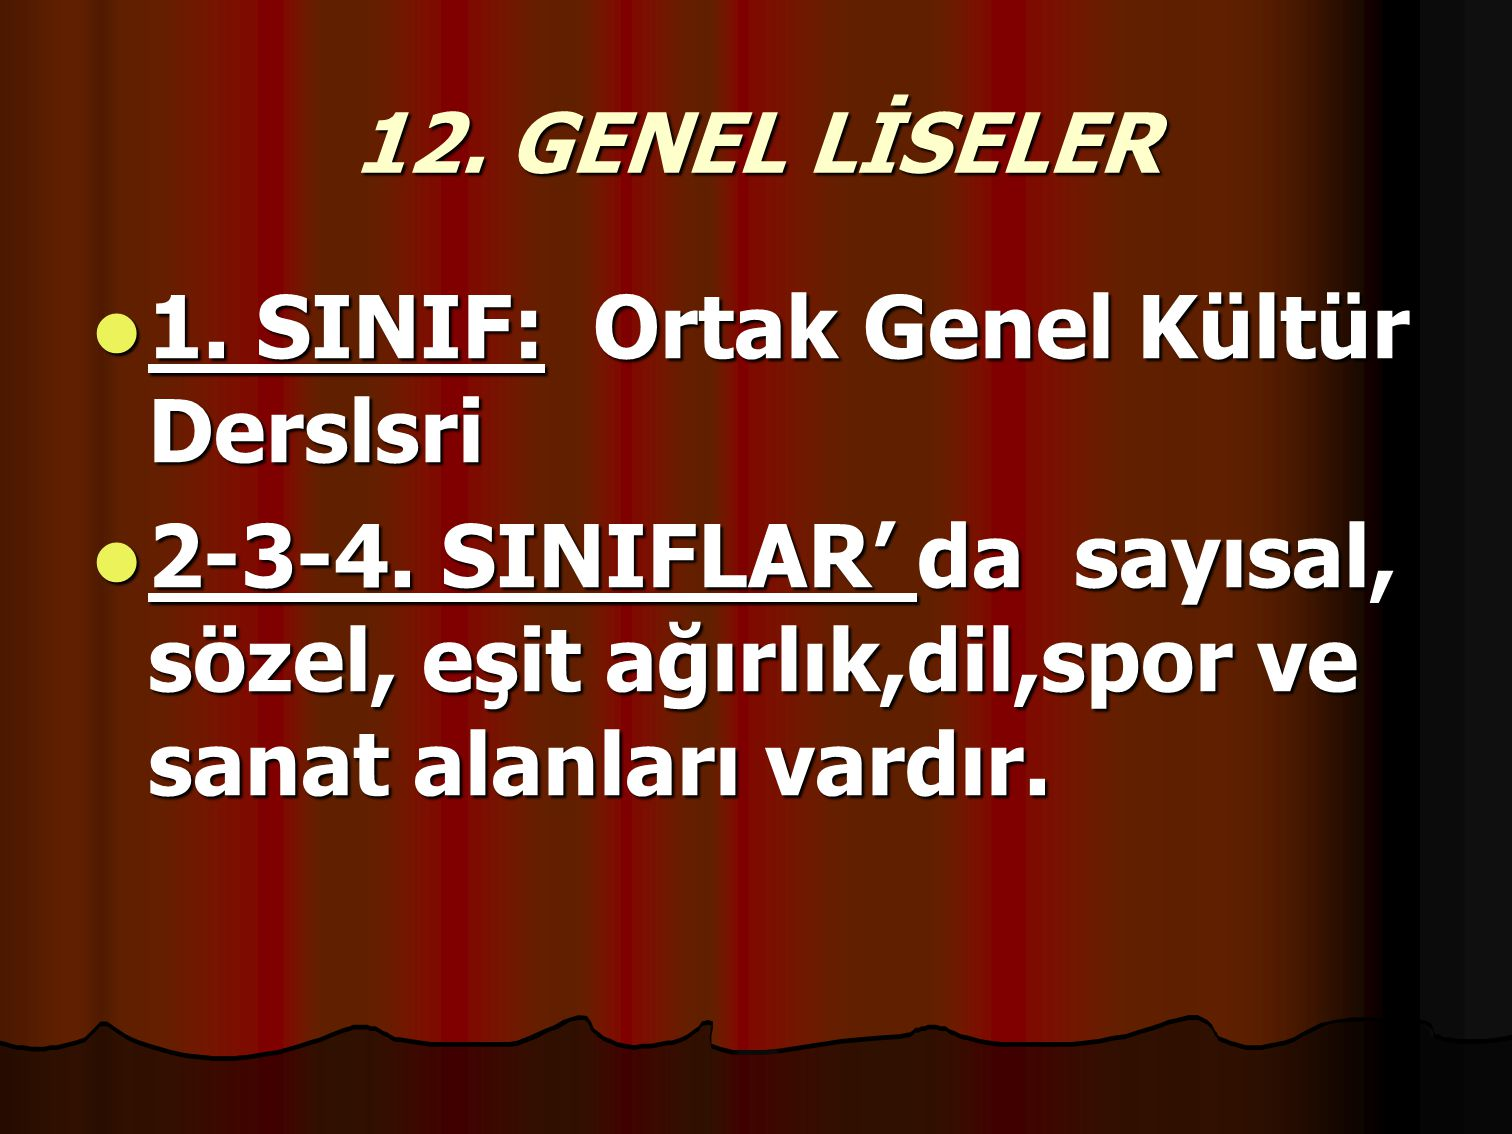 12.GENEL LİSELER 1. SINIF: Ortak Genel Kültür Derslsri 1.